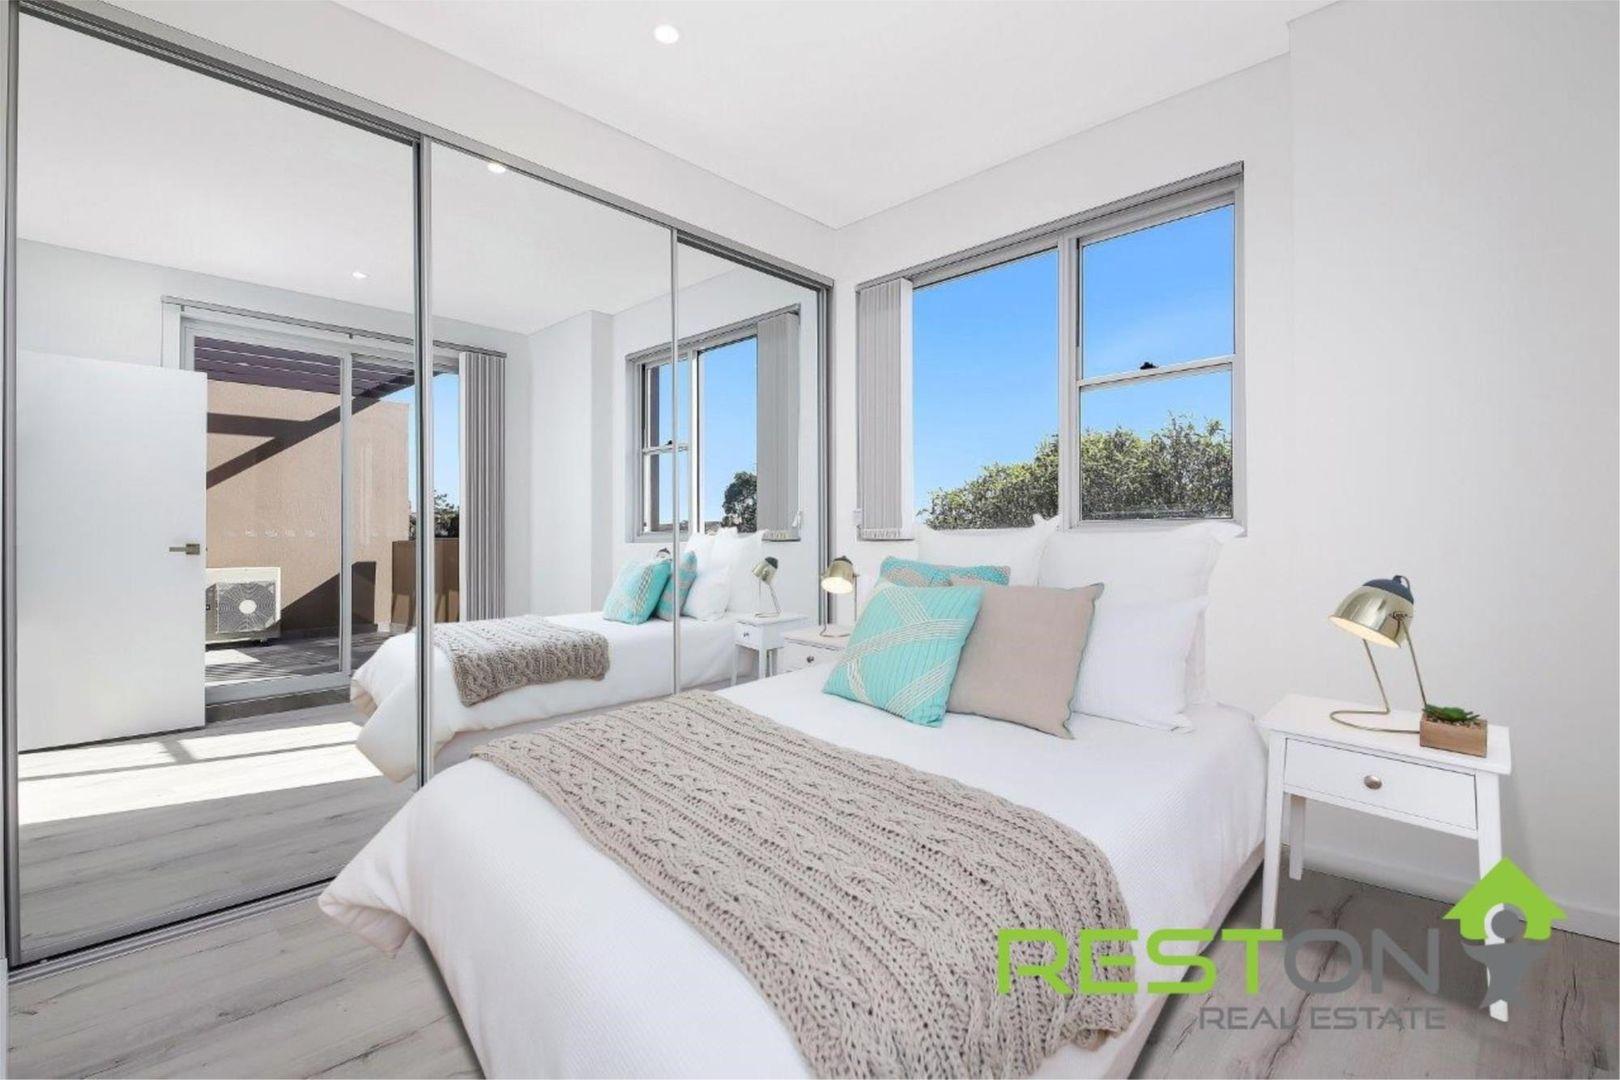 302/12-14 Mandemar Avenue, Homebush West NSW 2140, Image 1